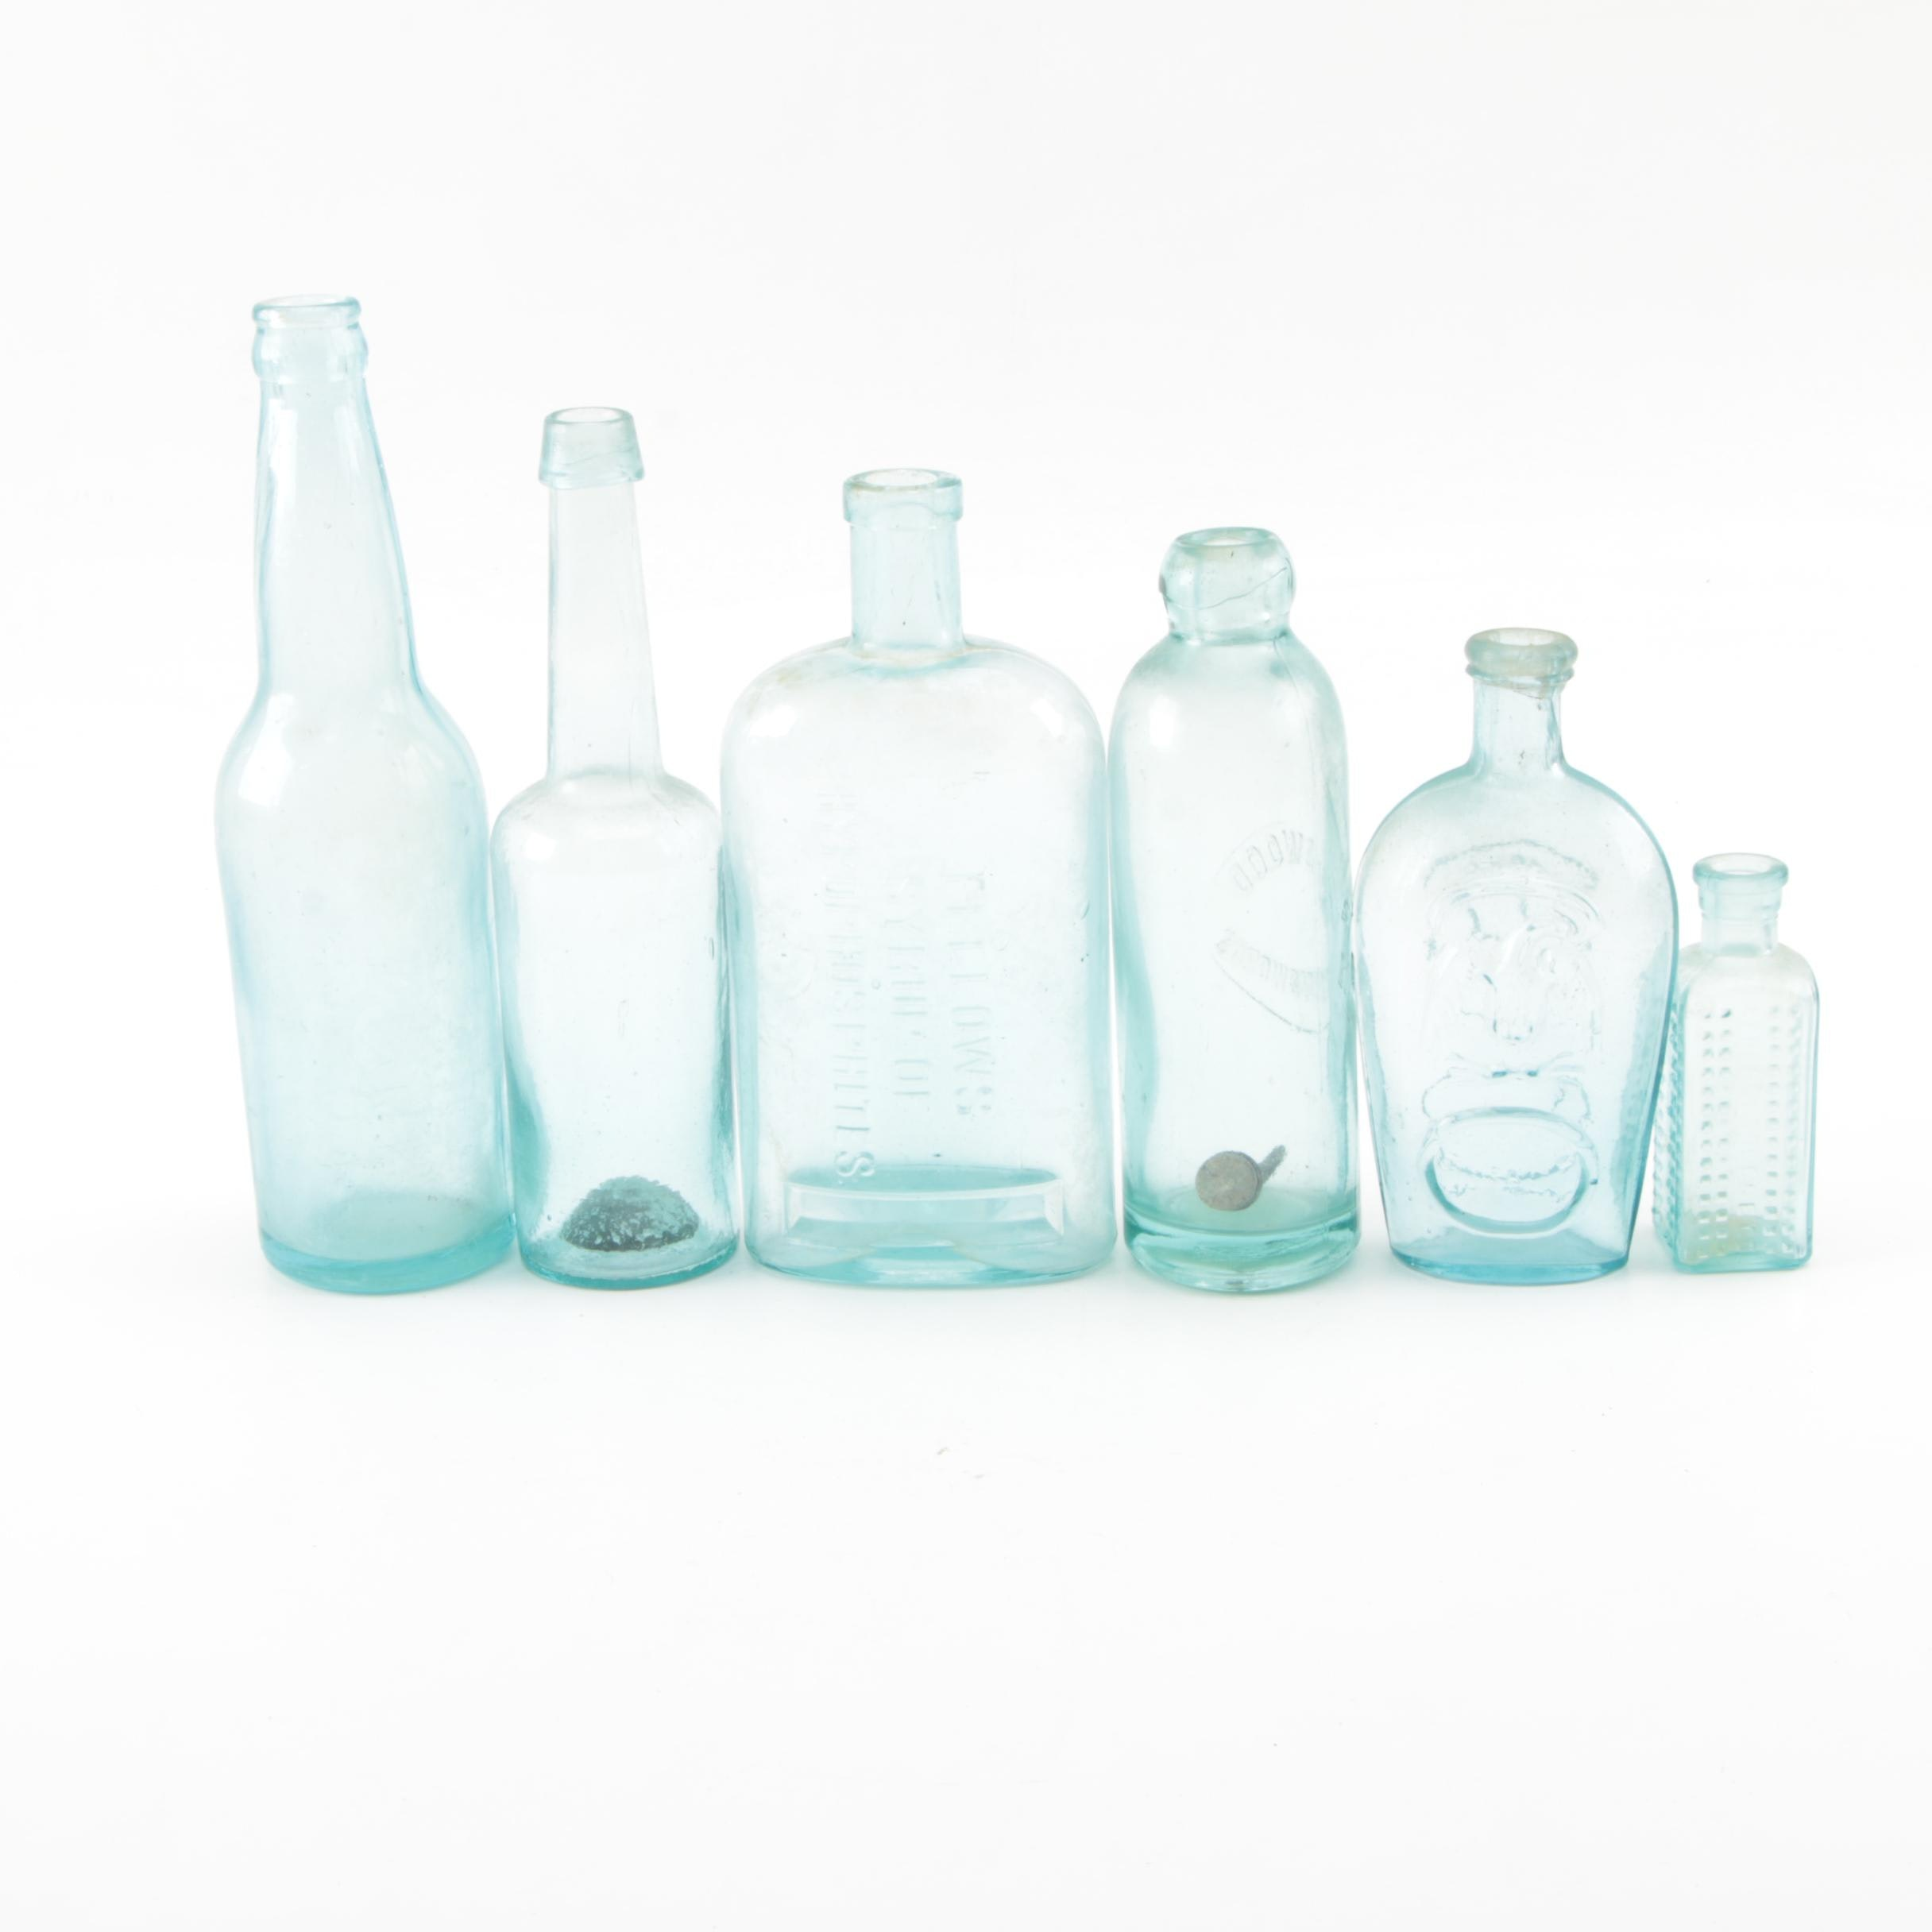 Six Vintage Glass Apothecary Bottles